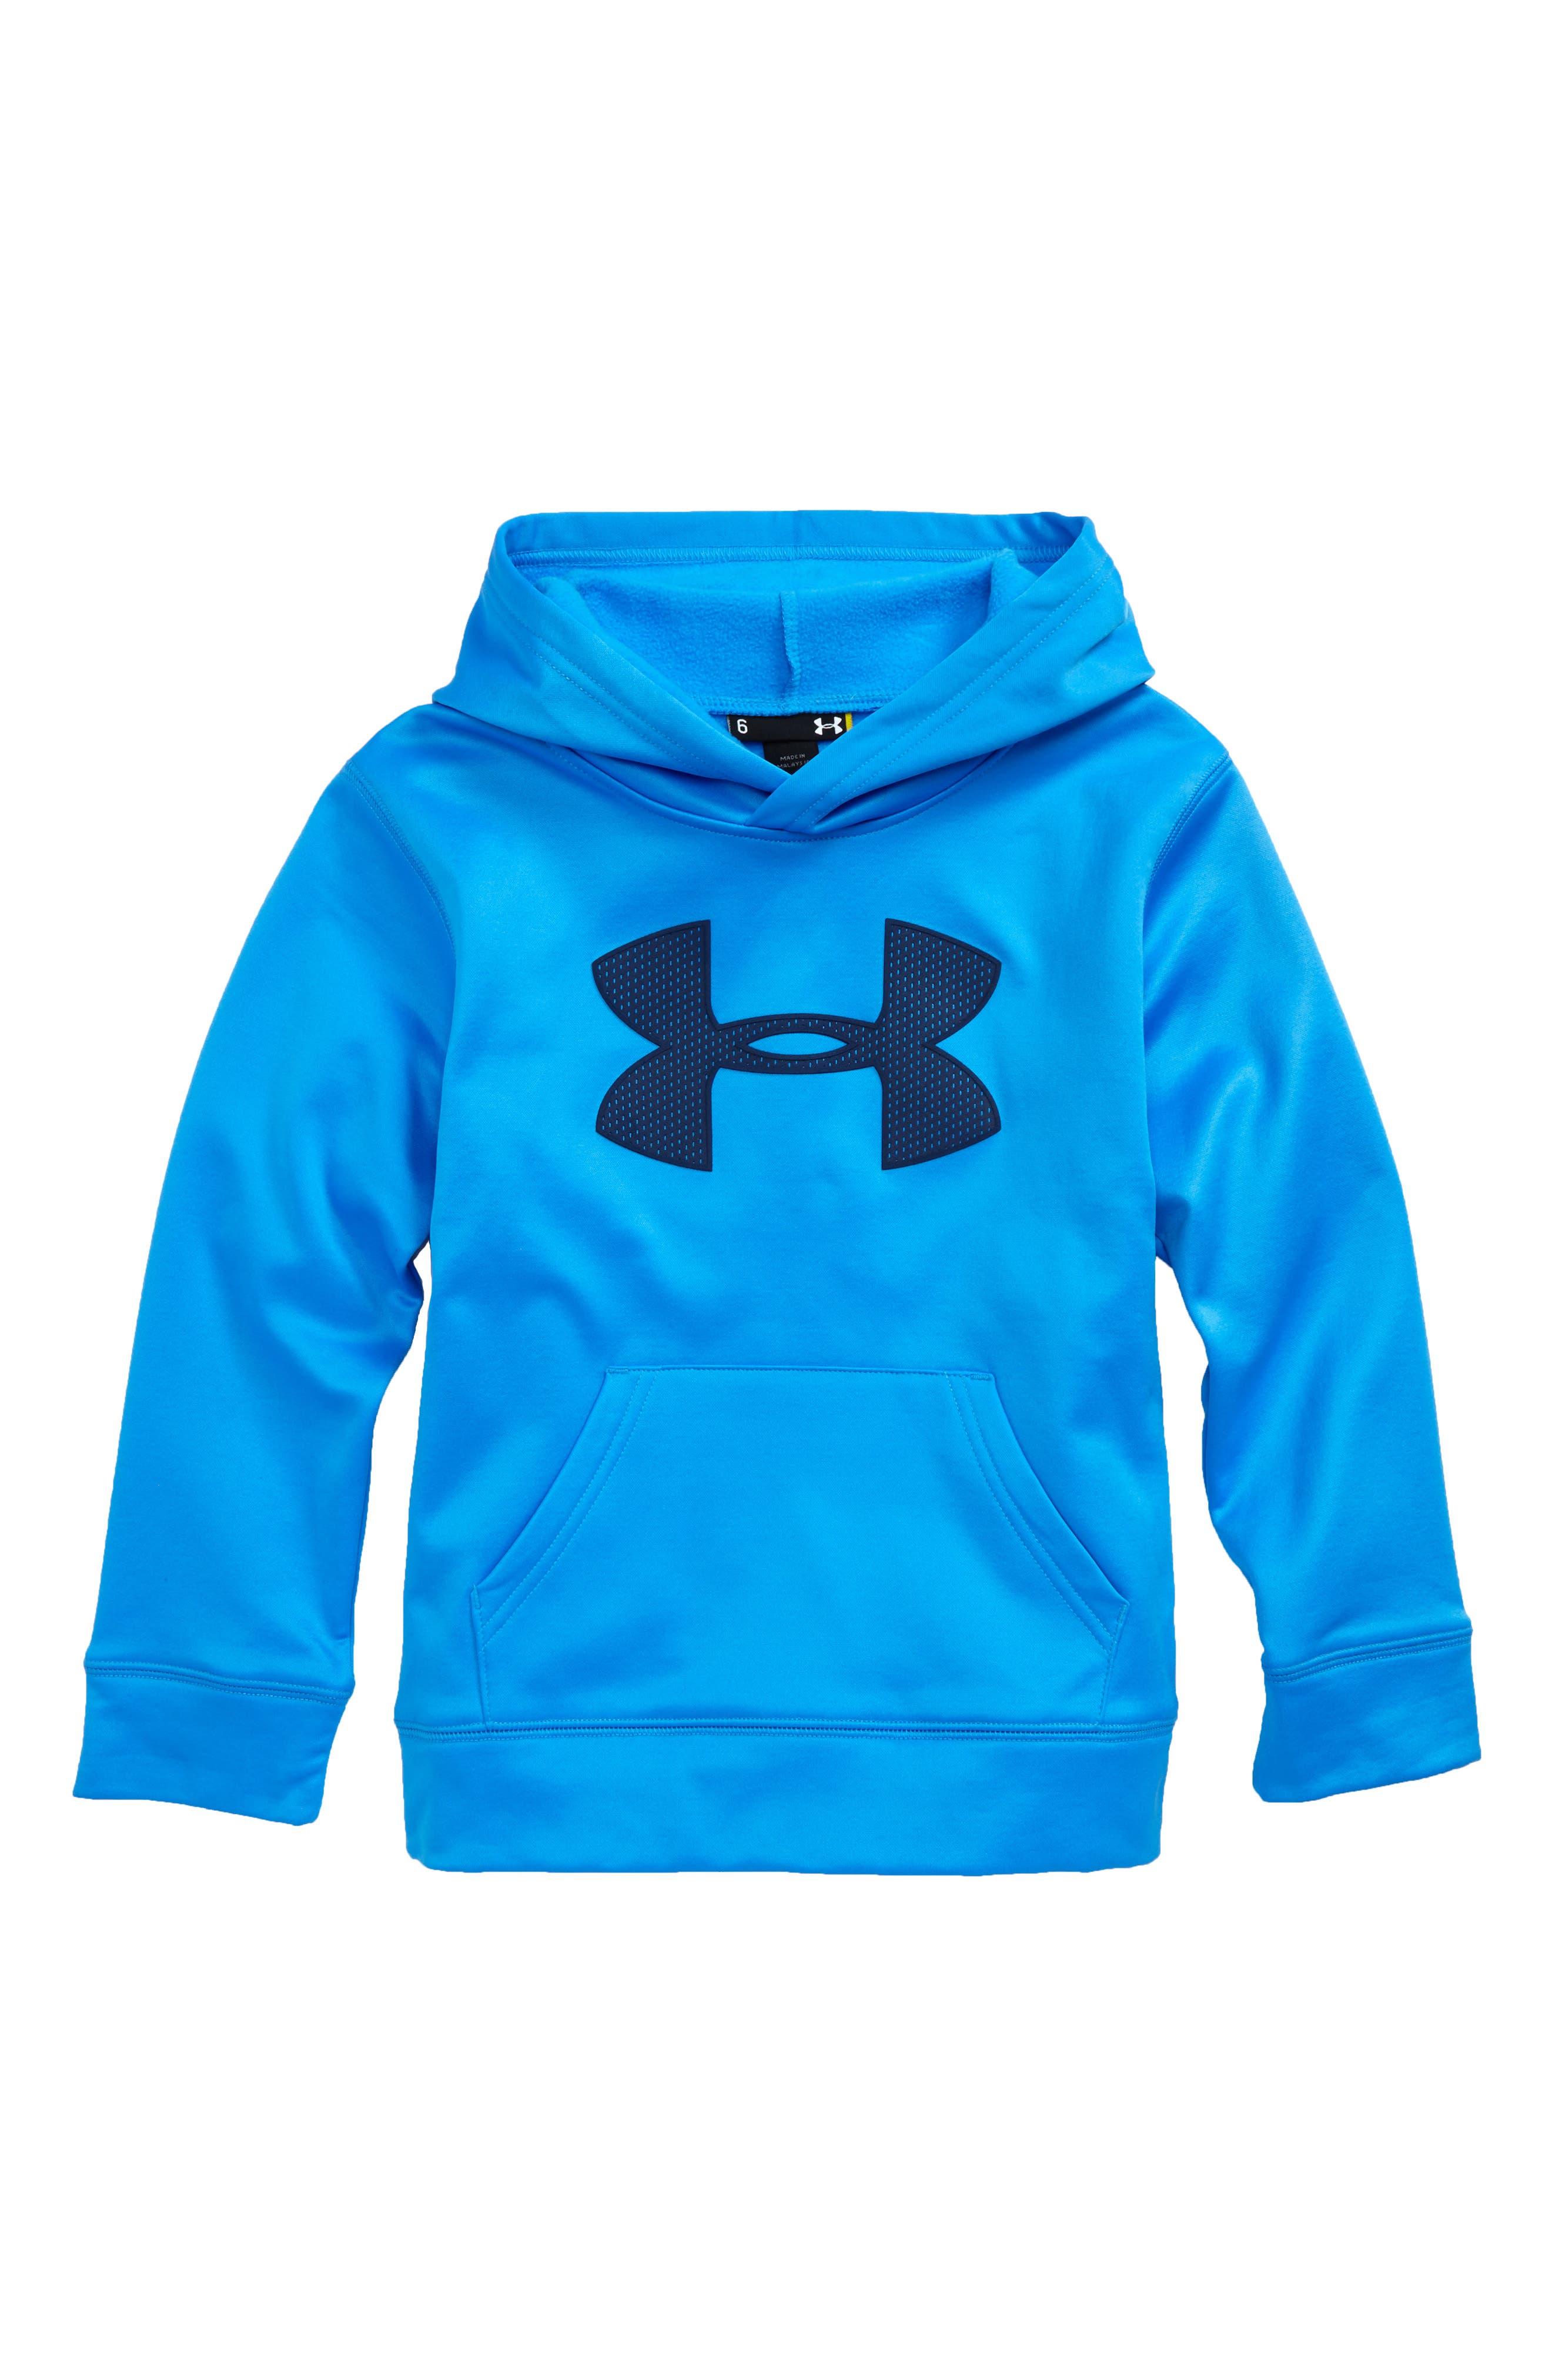 Under Armour Mesh Big Logo Pullover Hoodie (Little Boys)